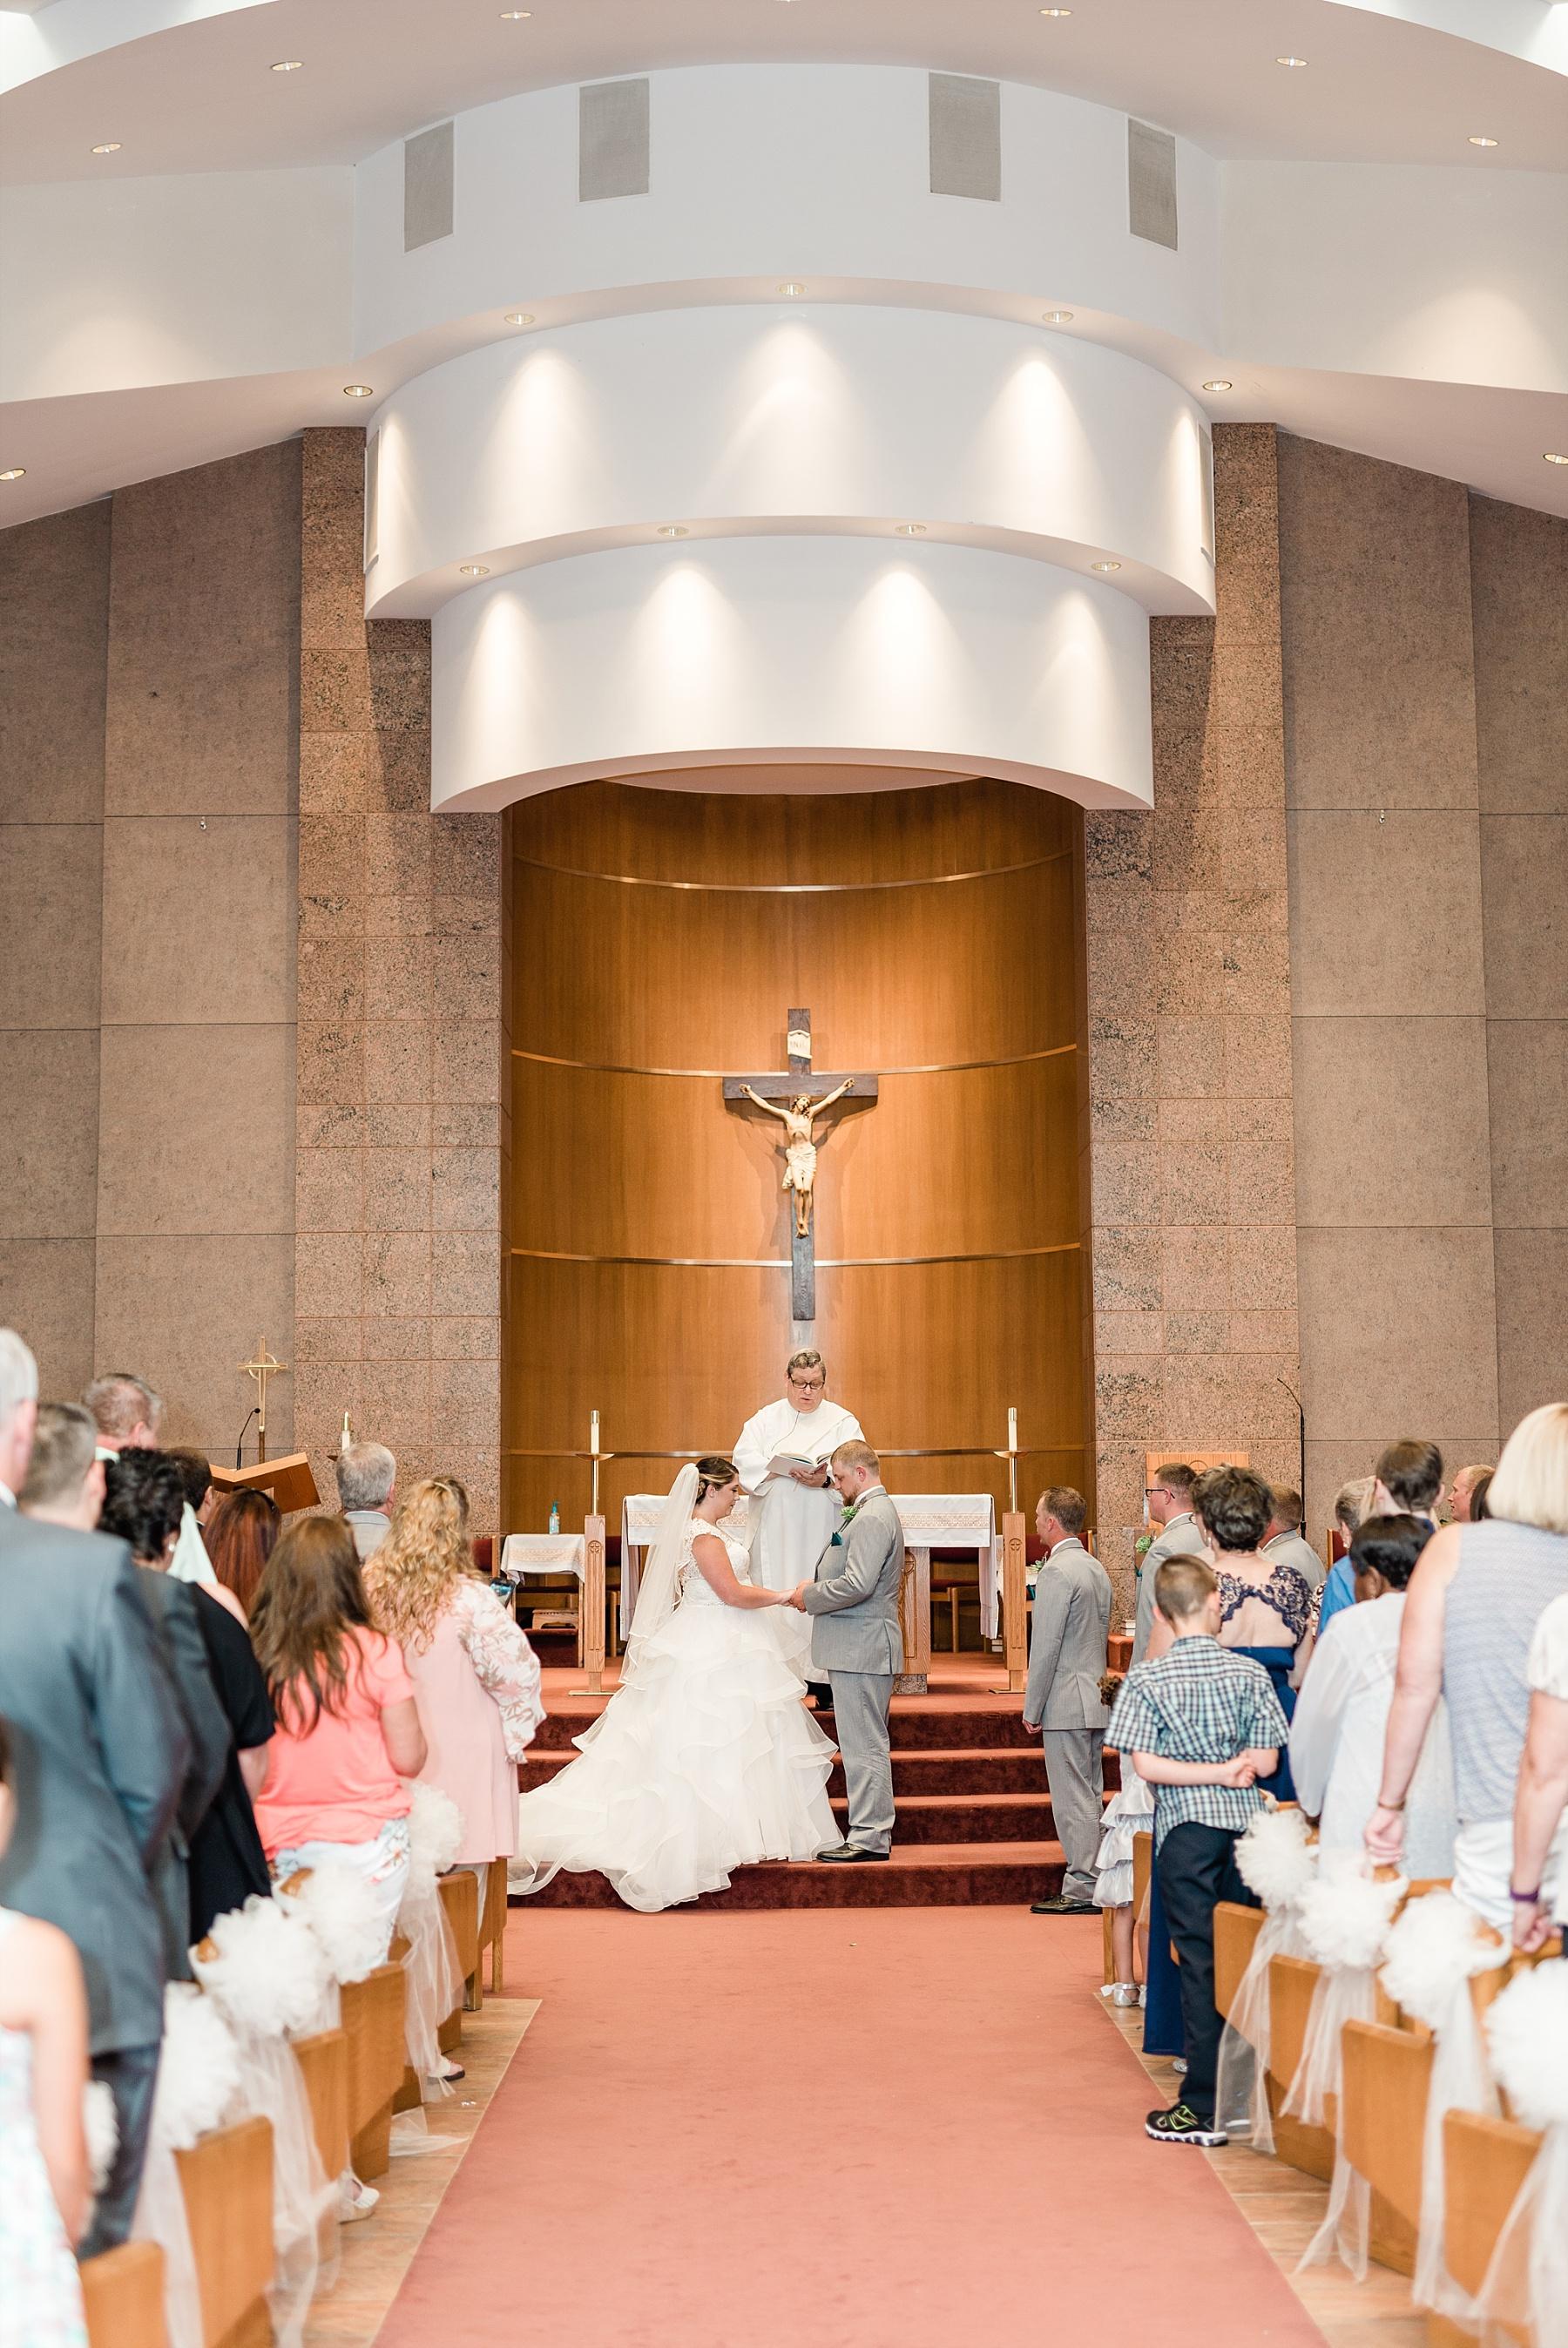 Baurichter Wedding at Stoney Creek Inn Columbia Missouri by Kelsi Kliethermes Photography_0012.jpg